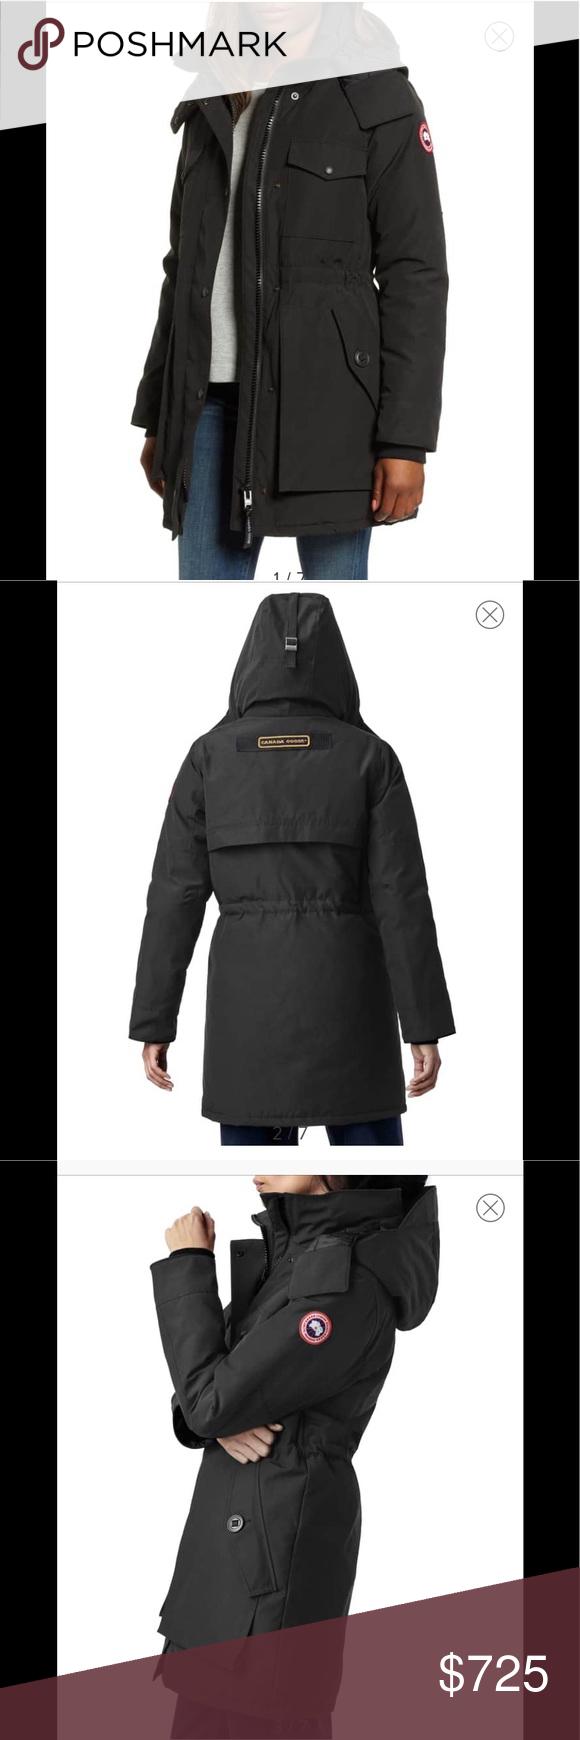 Canada Goose Gabriola H2o Resistant Parka Clothes Design Fashion Design Fashion